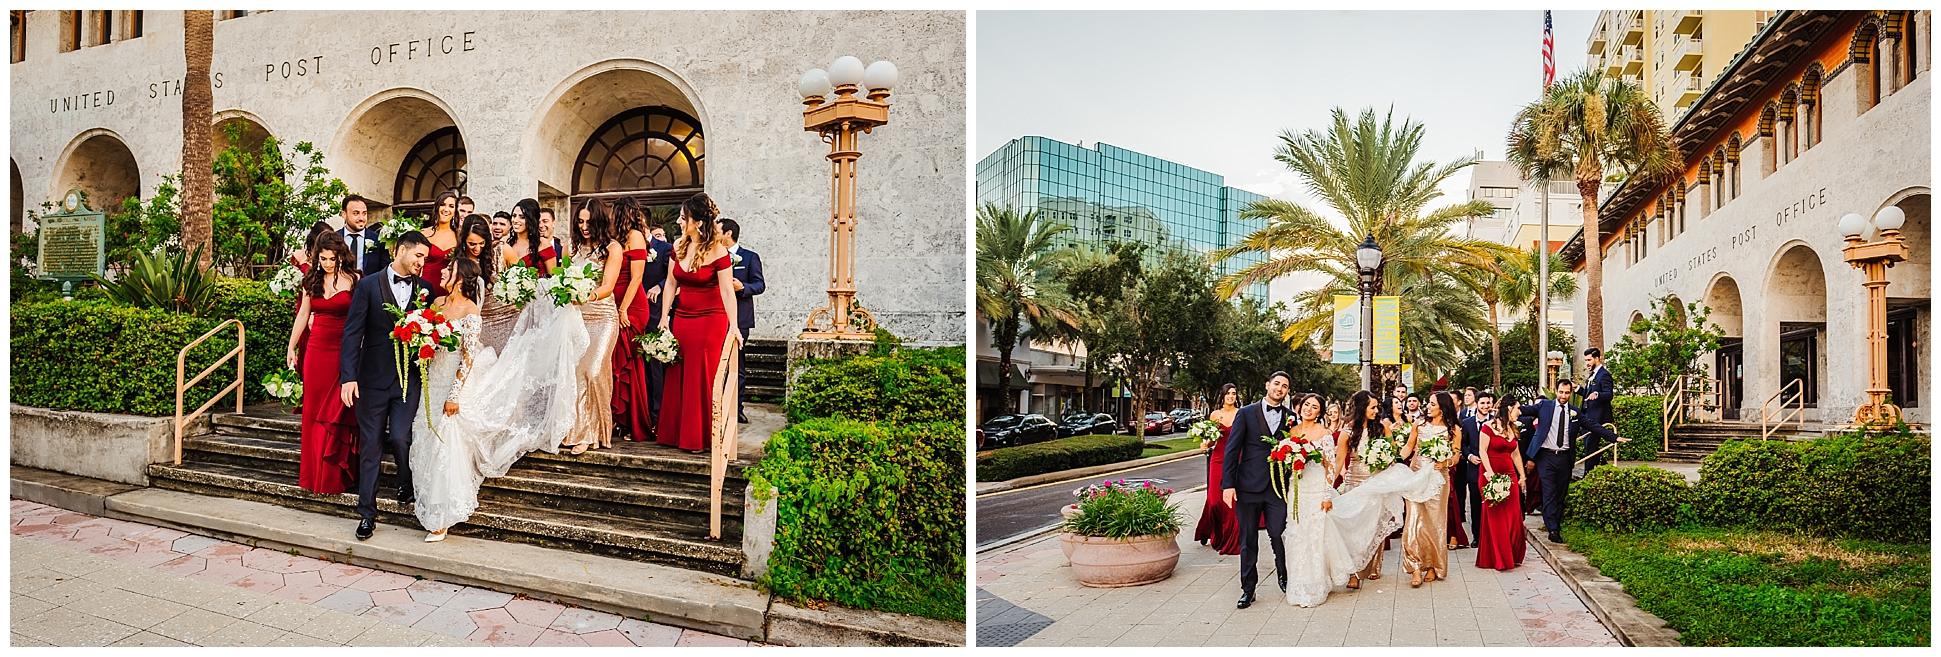 indian-armenian-clearwater-wedding-chic-luxury-photogaphy_0076.jpg